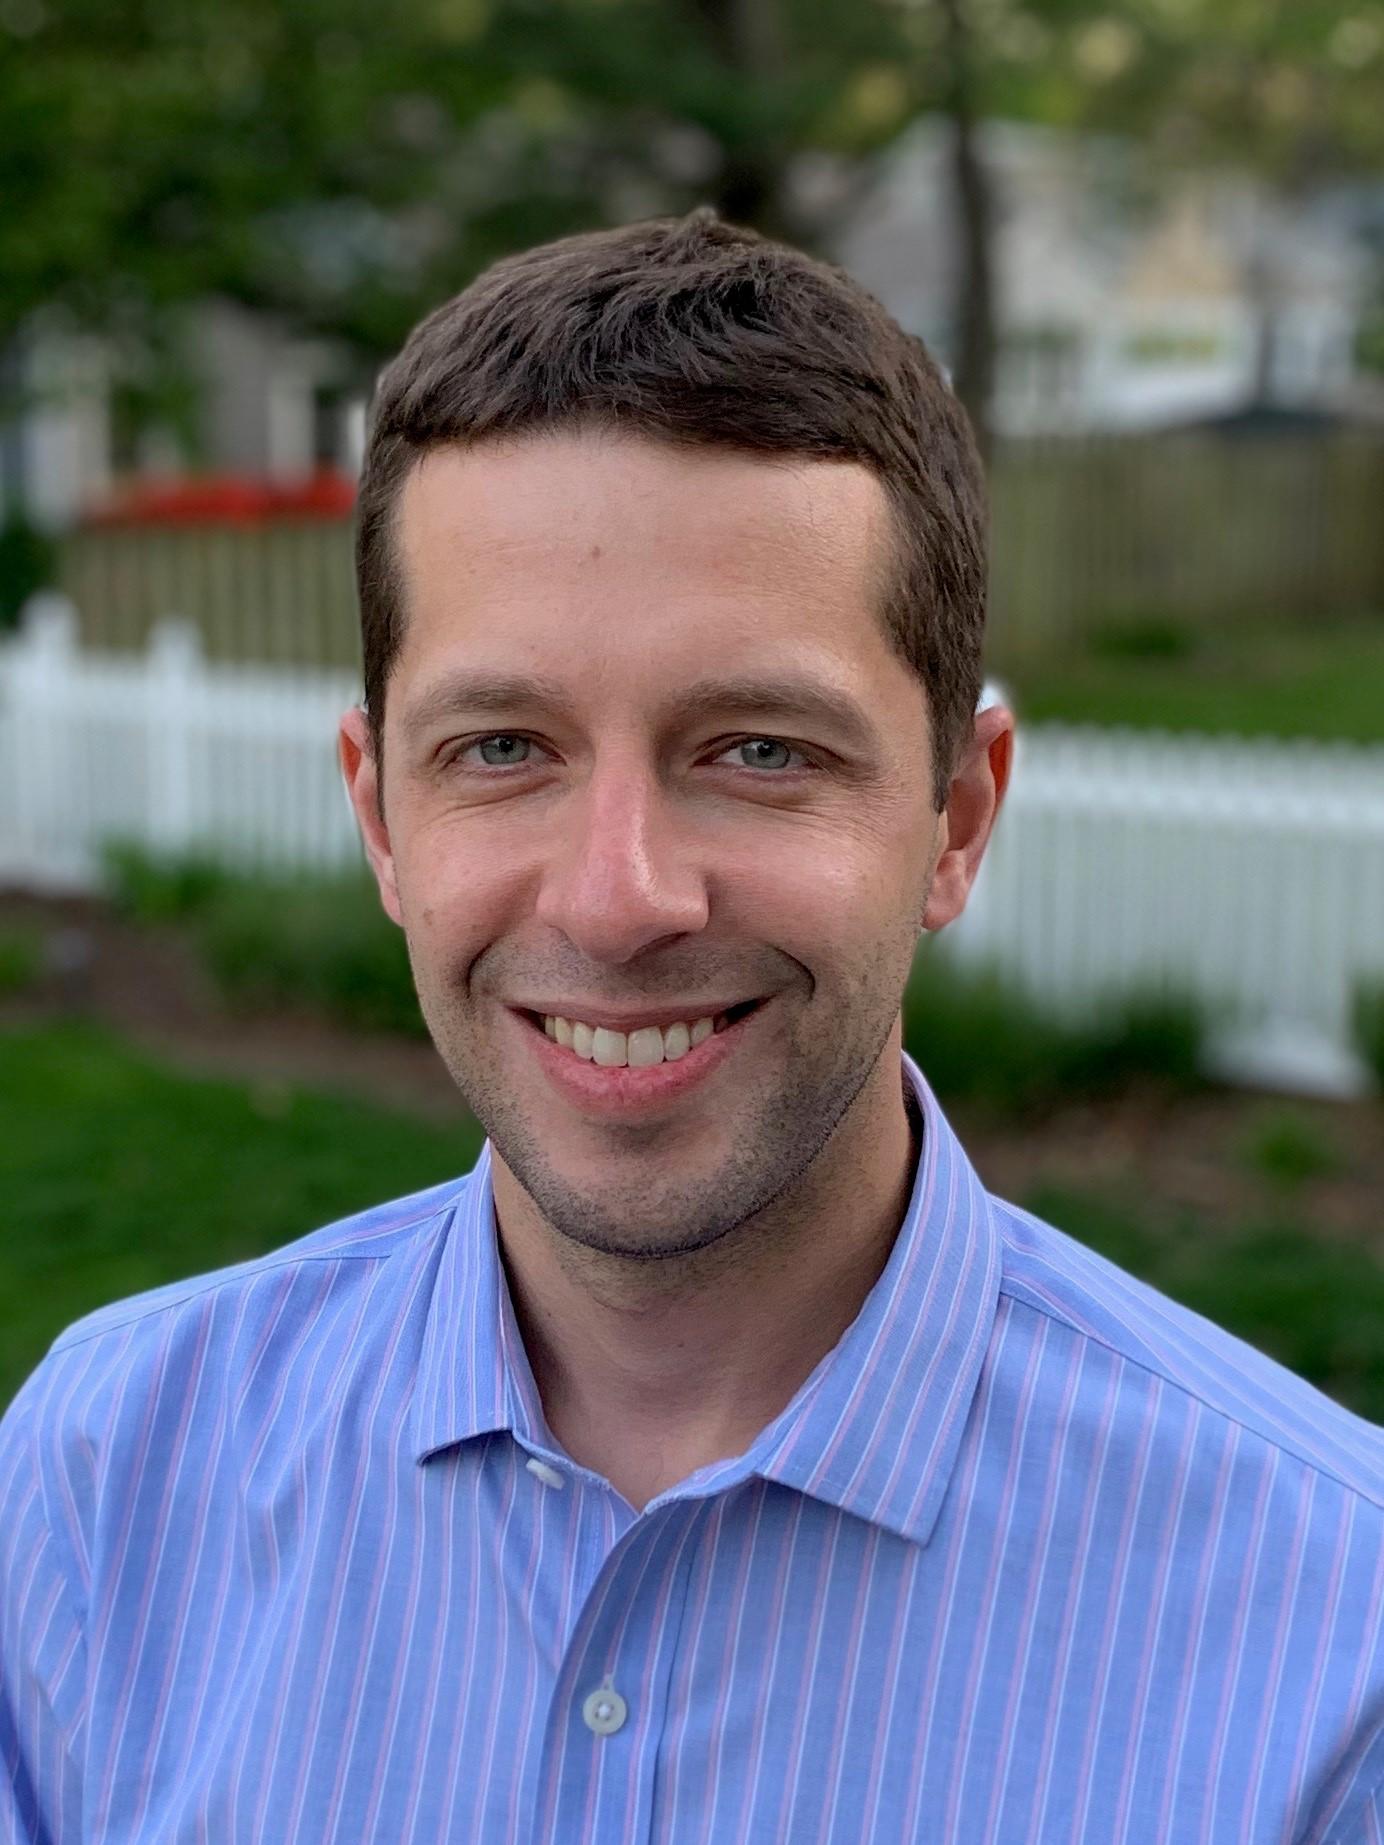 Ben Grin,医学博士,公共卫生硕士,AAHIVS内科医生